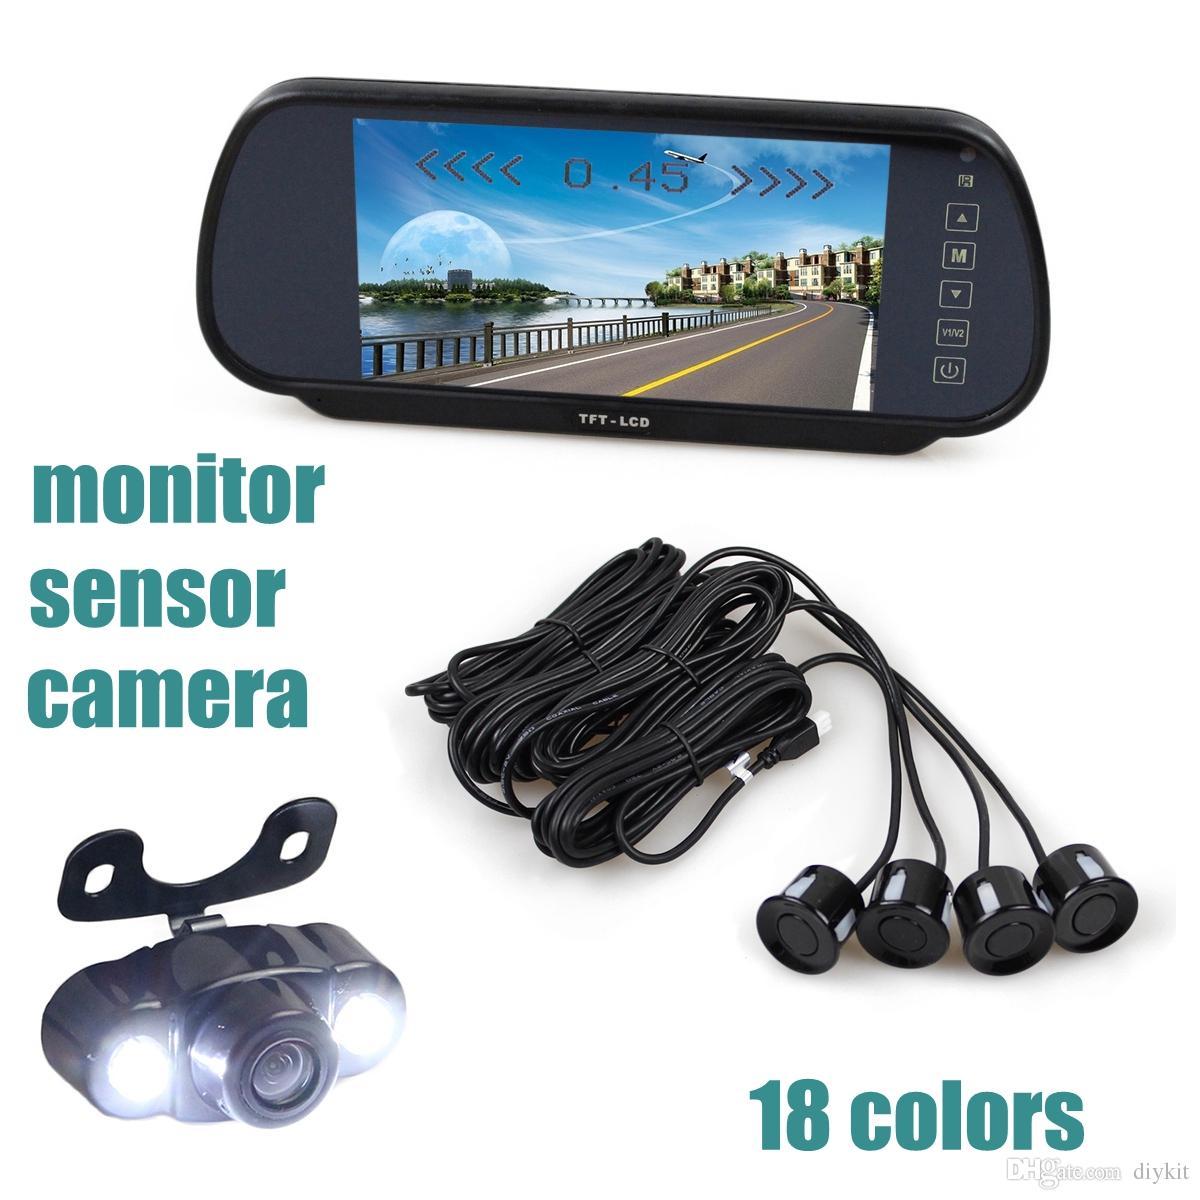 Video Parking Radar 4 Sensors + 7 inch Build-in LCD Display Mirror Car Monitor + 4 x LED Night Vision HD Rear View Car Camera